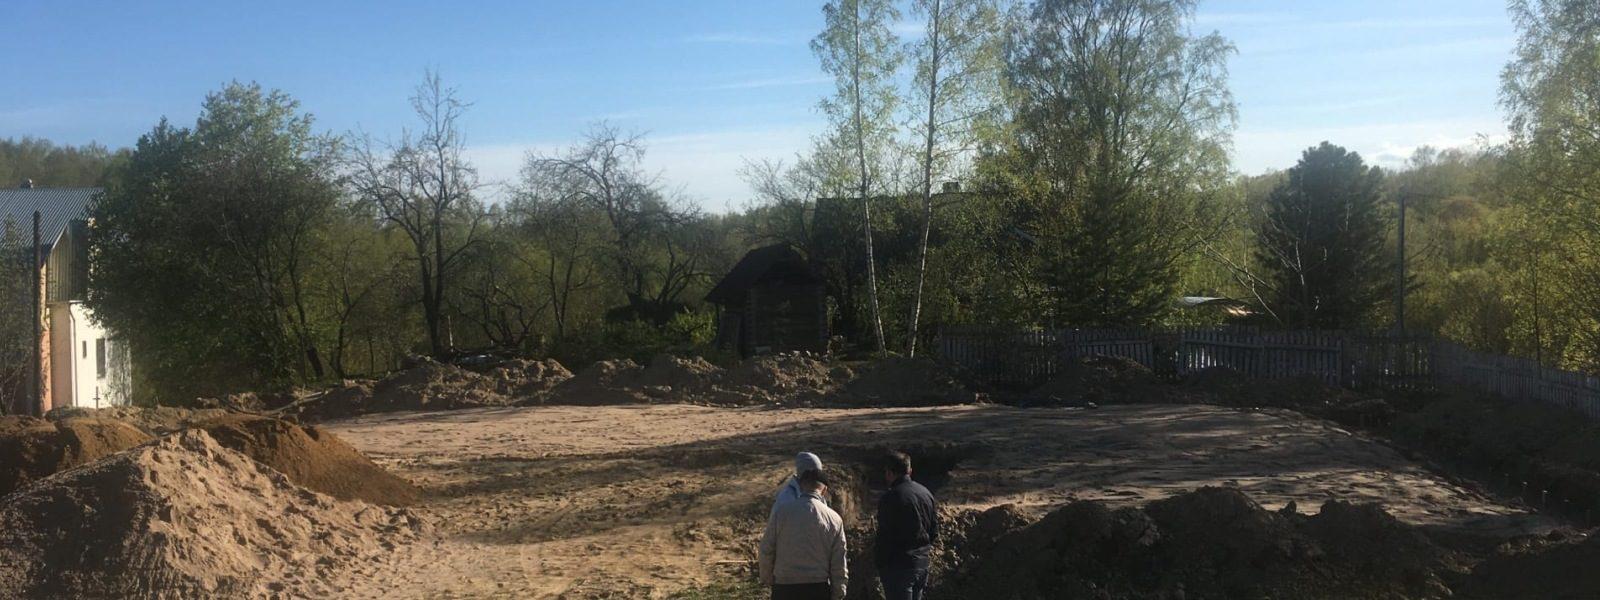 Началось строительство нового корпуса ТИЦИ!